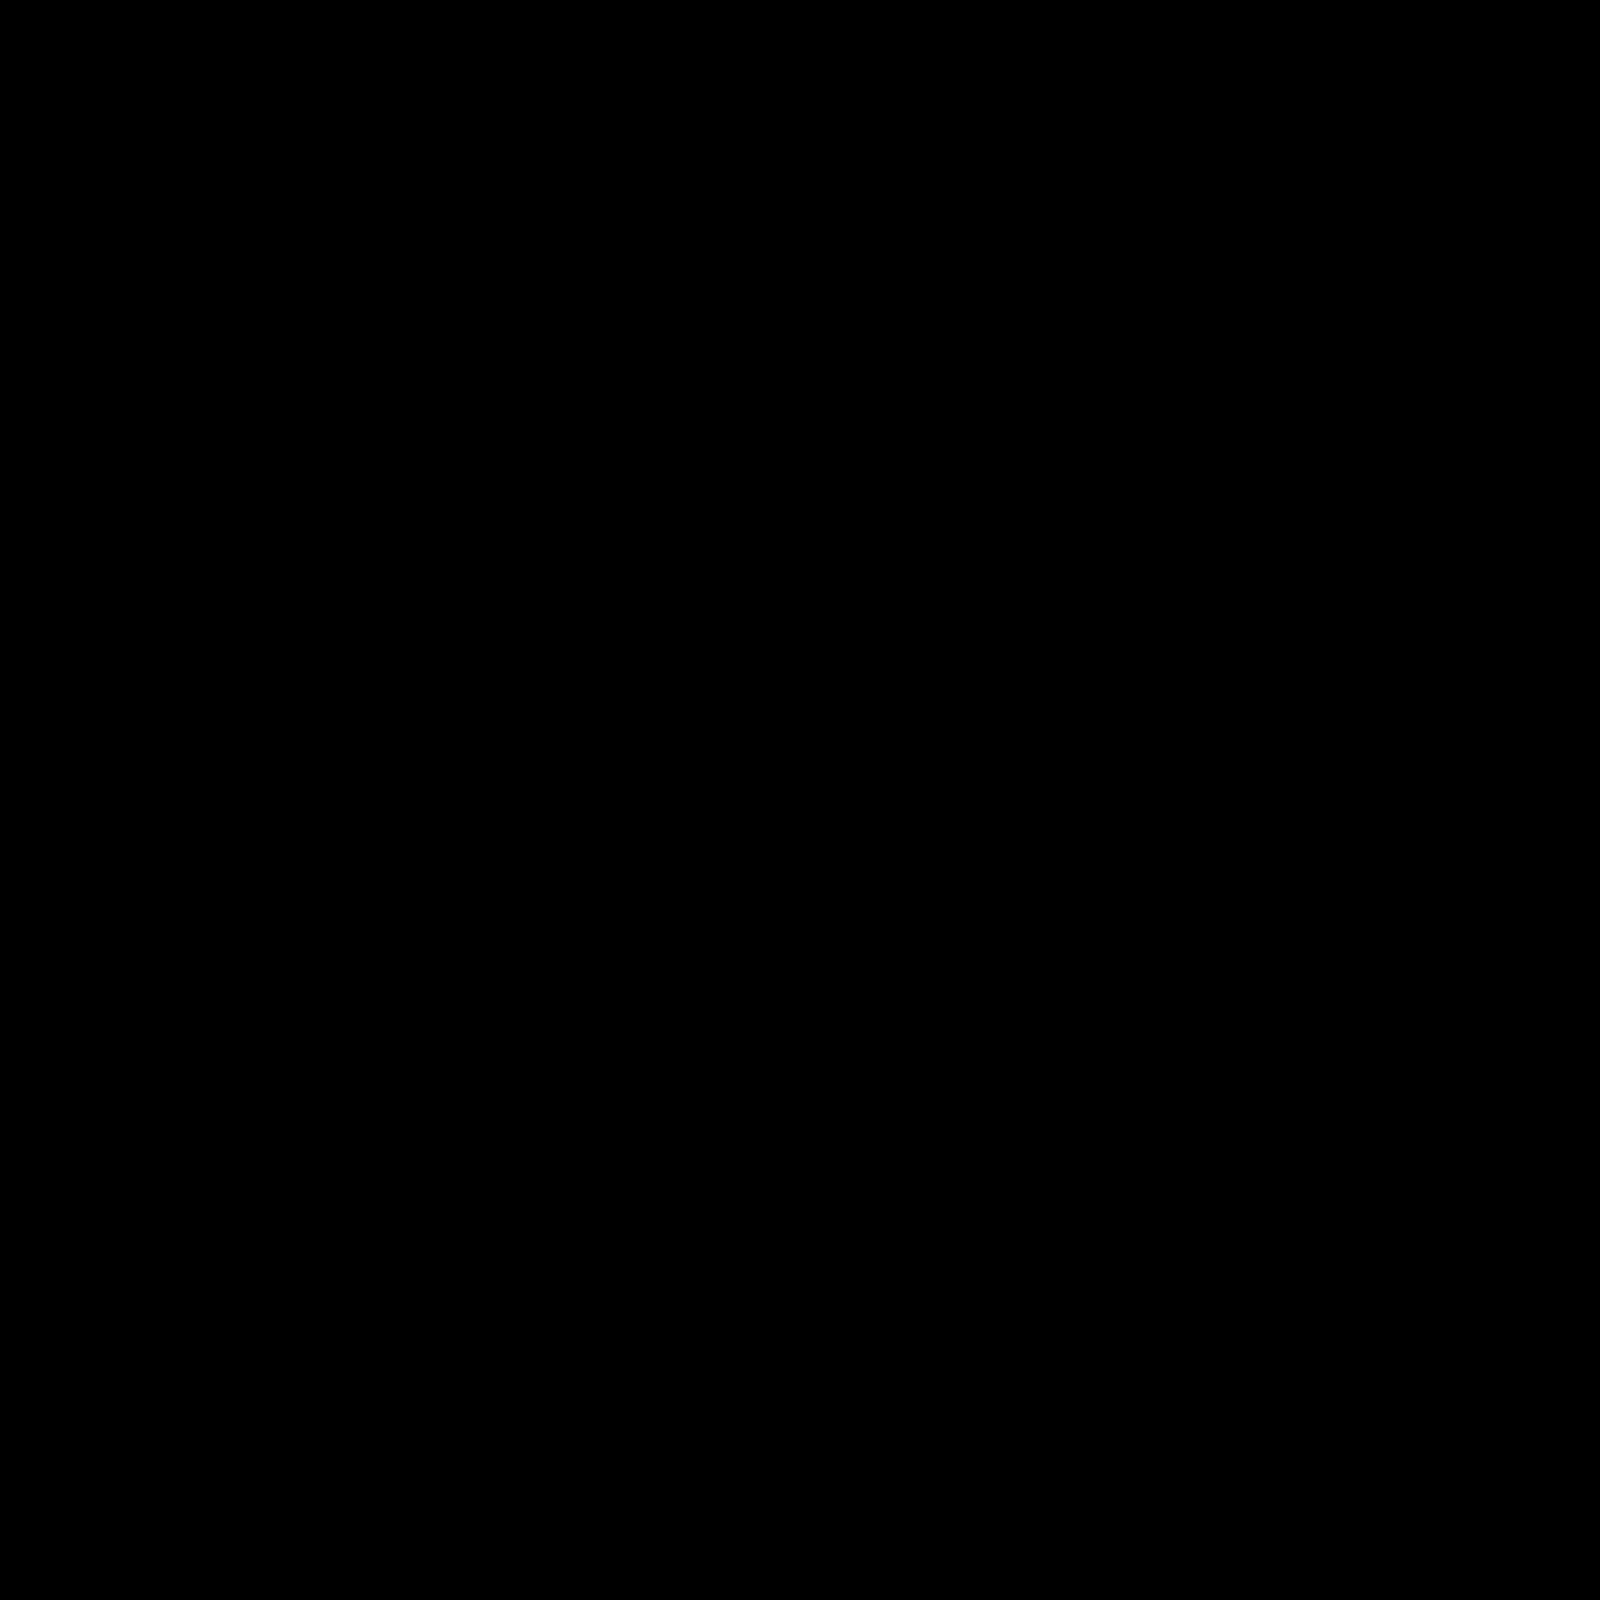 插入万事达卡 icon